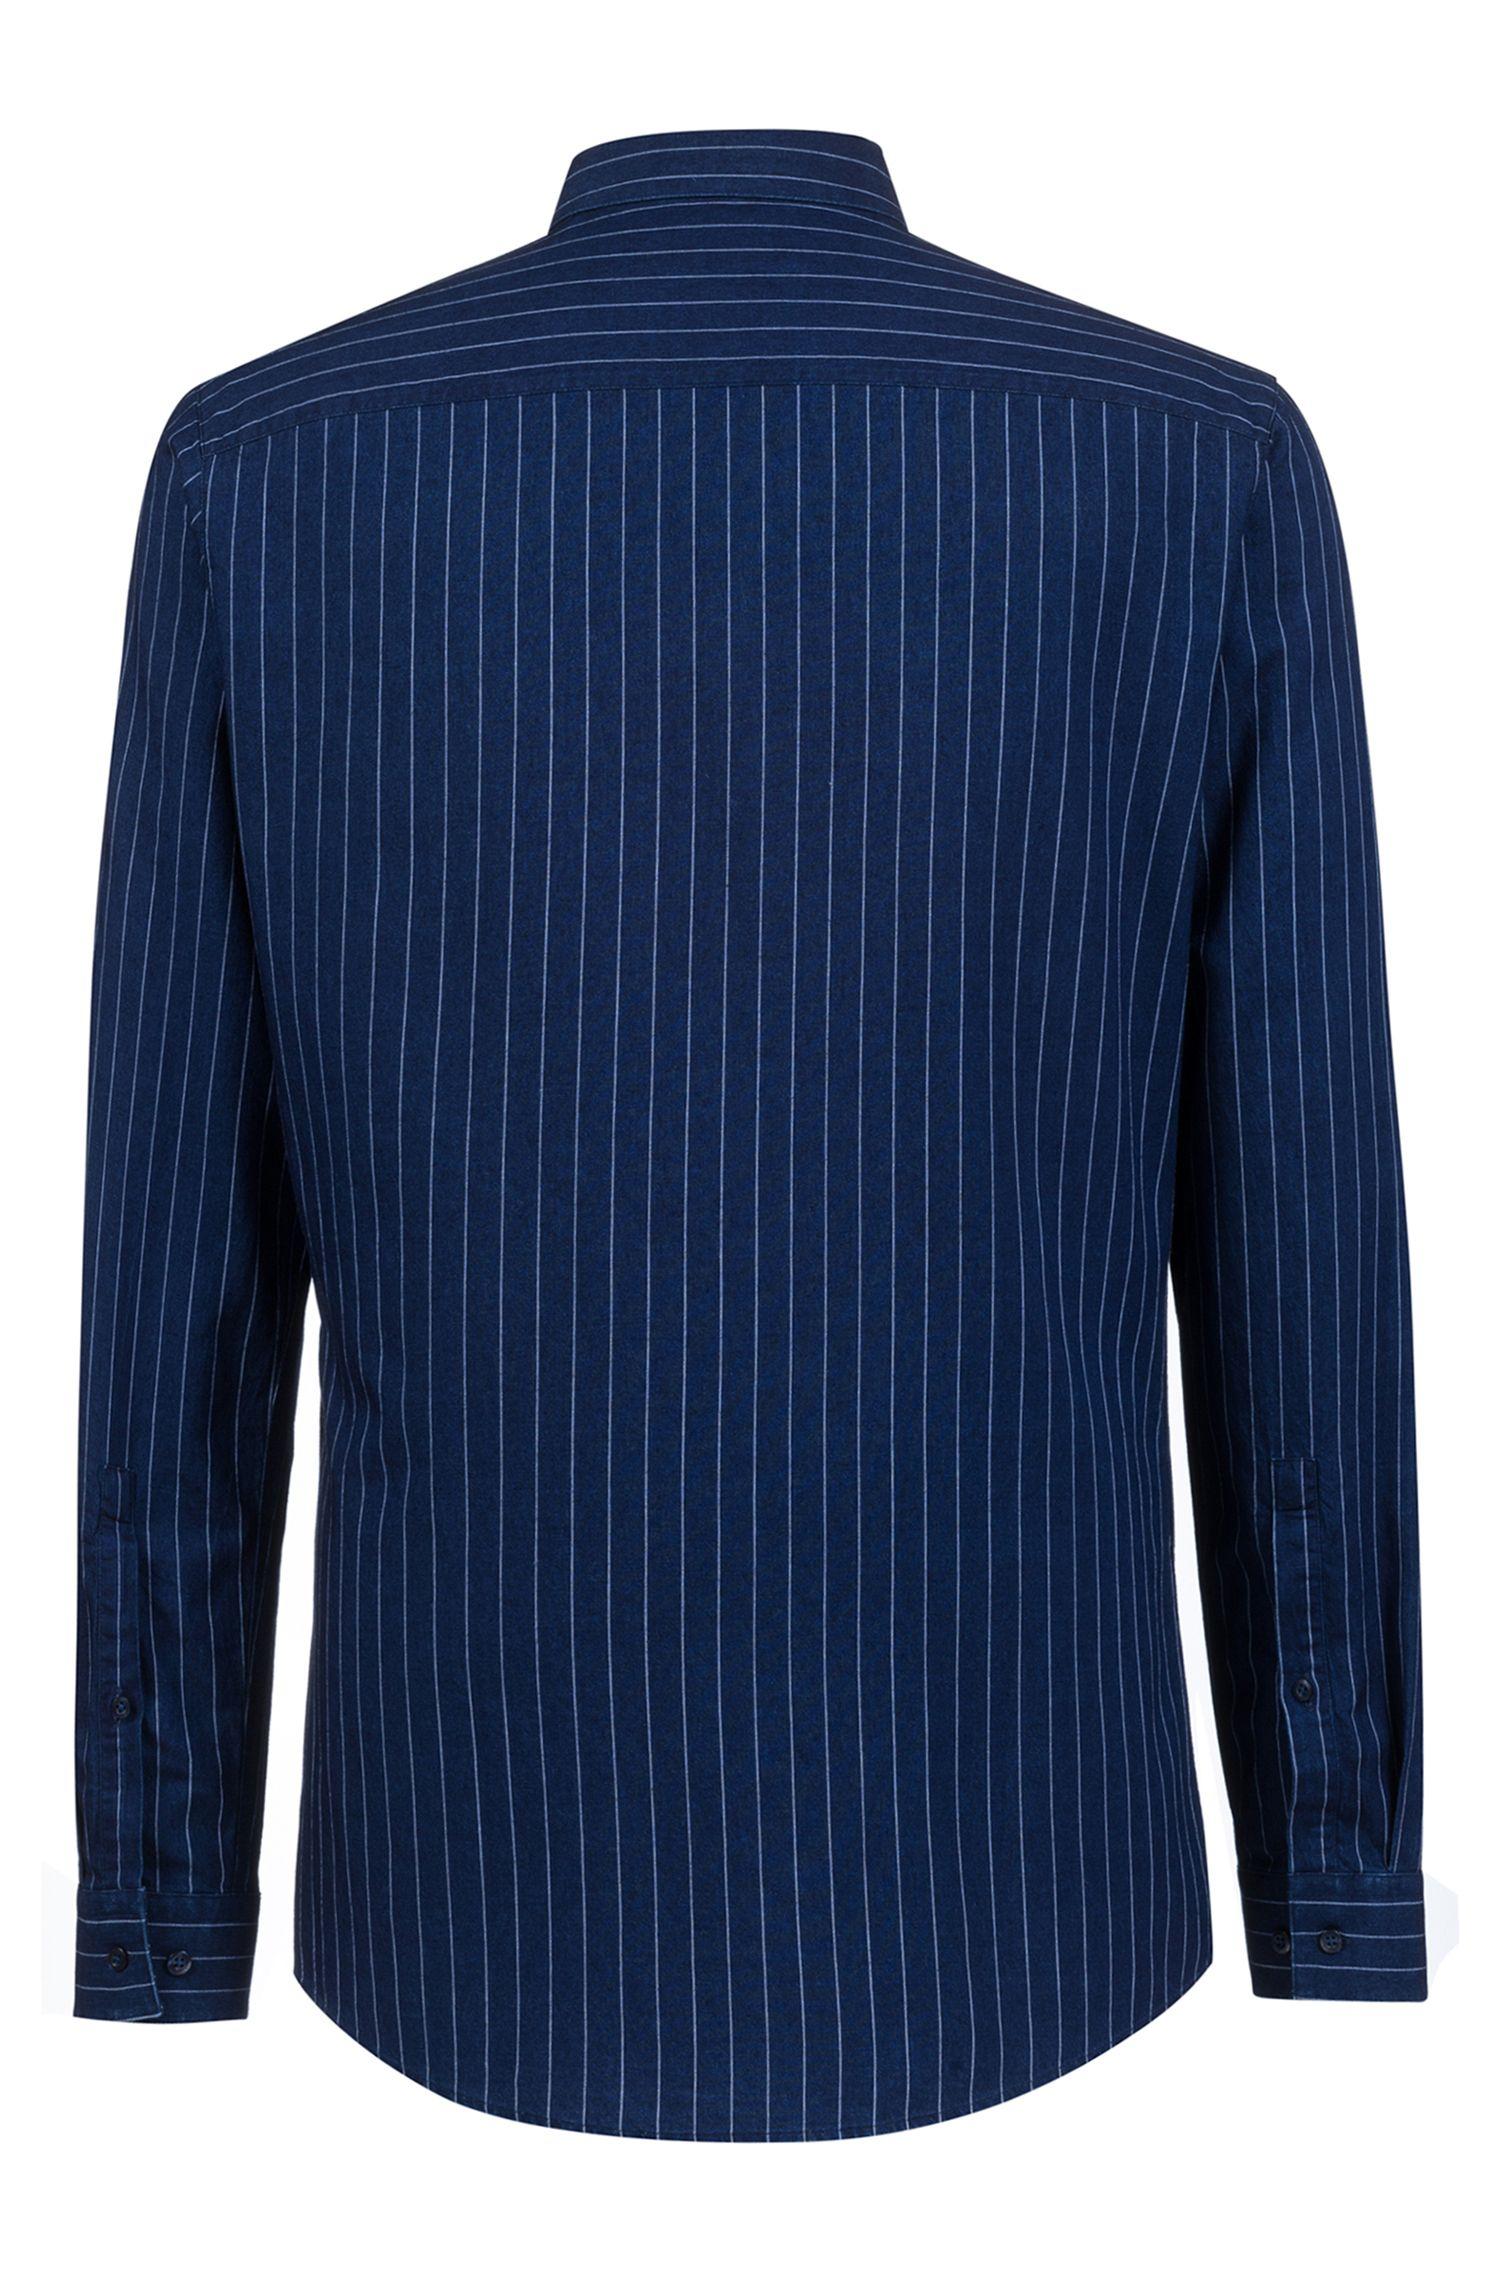 Extra-slim-fit shirt in Italian denim with pinstripes, Dark Blue